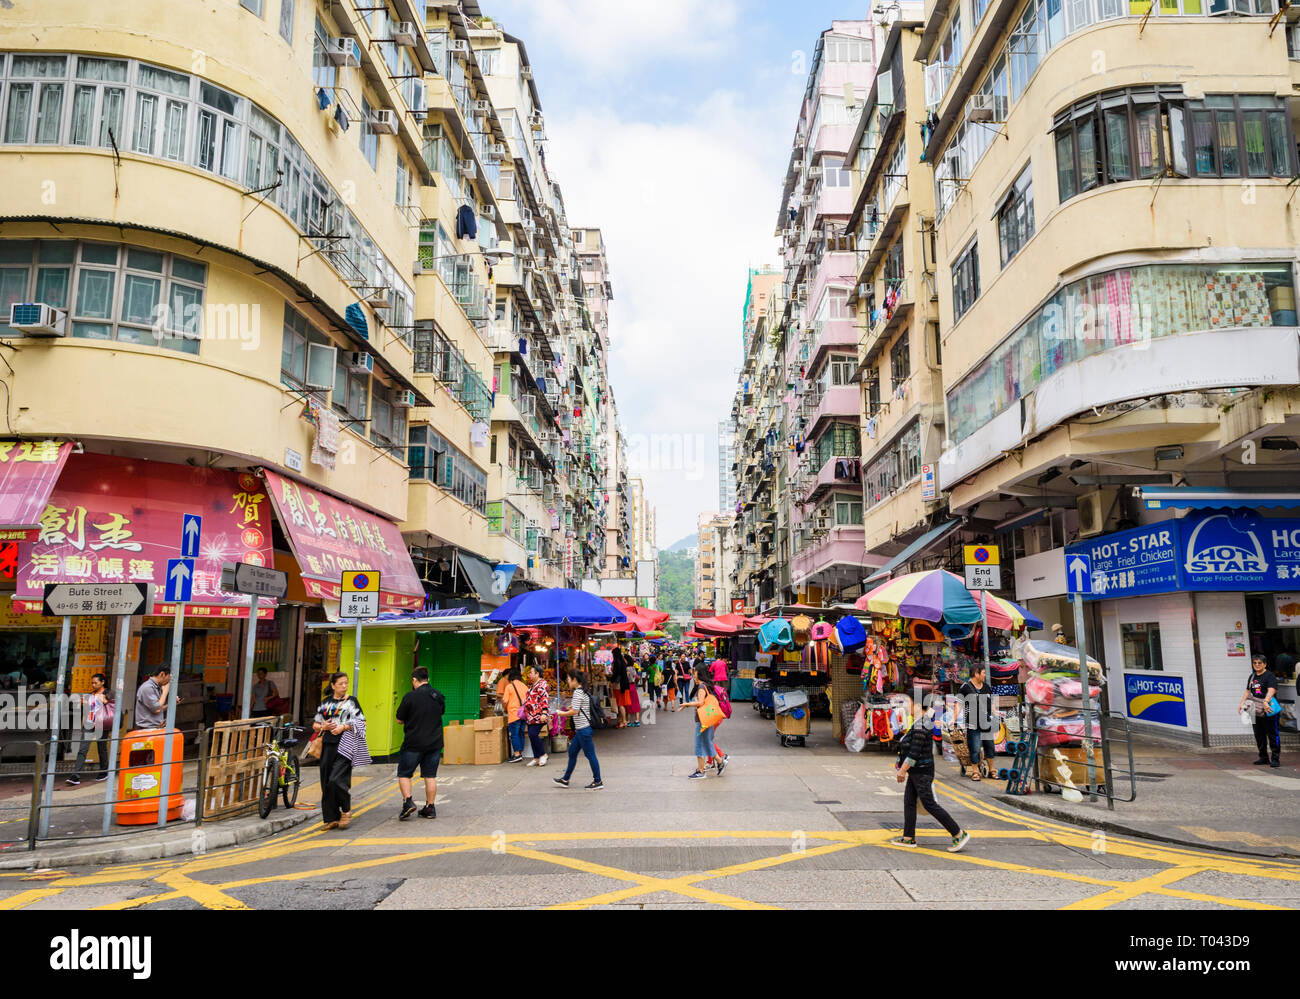 Les alentours de la rue du marché le long de la Fa Yuen Street, Mongkok, Hong Kong Photo Stock